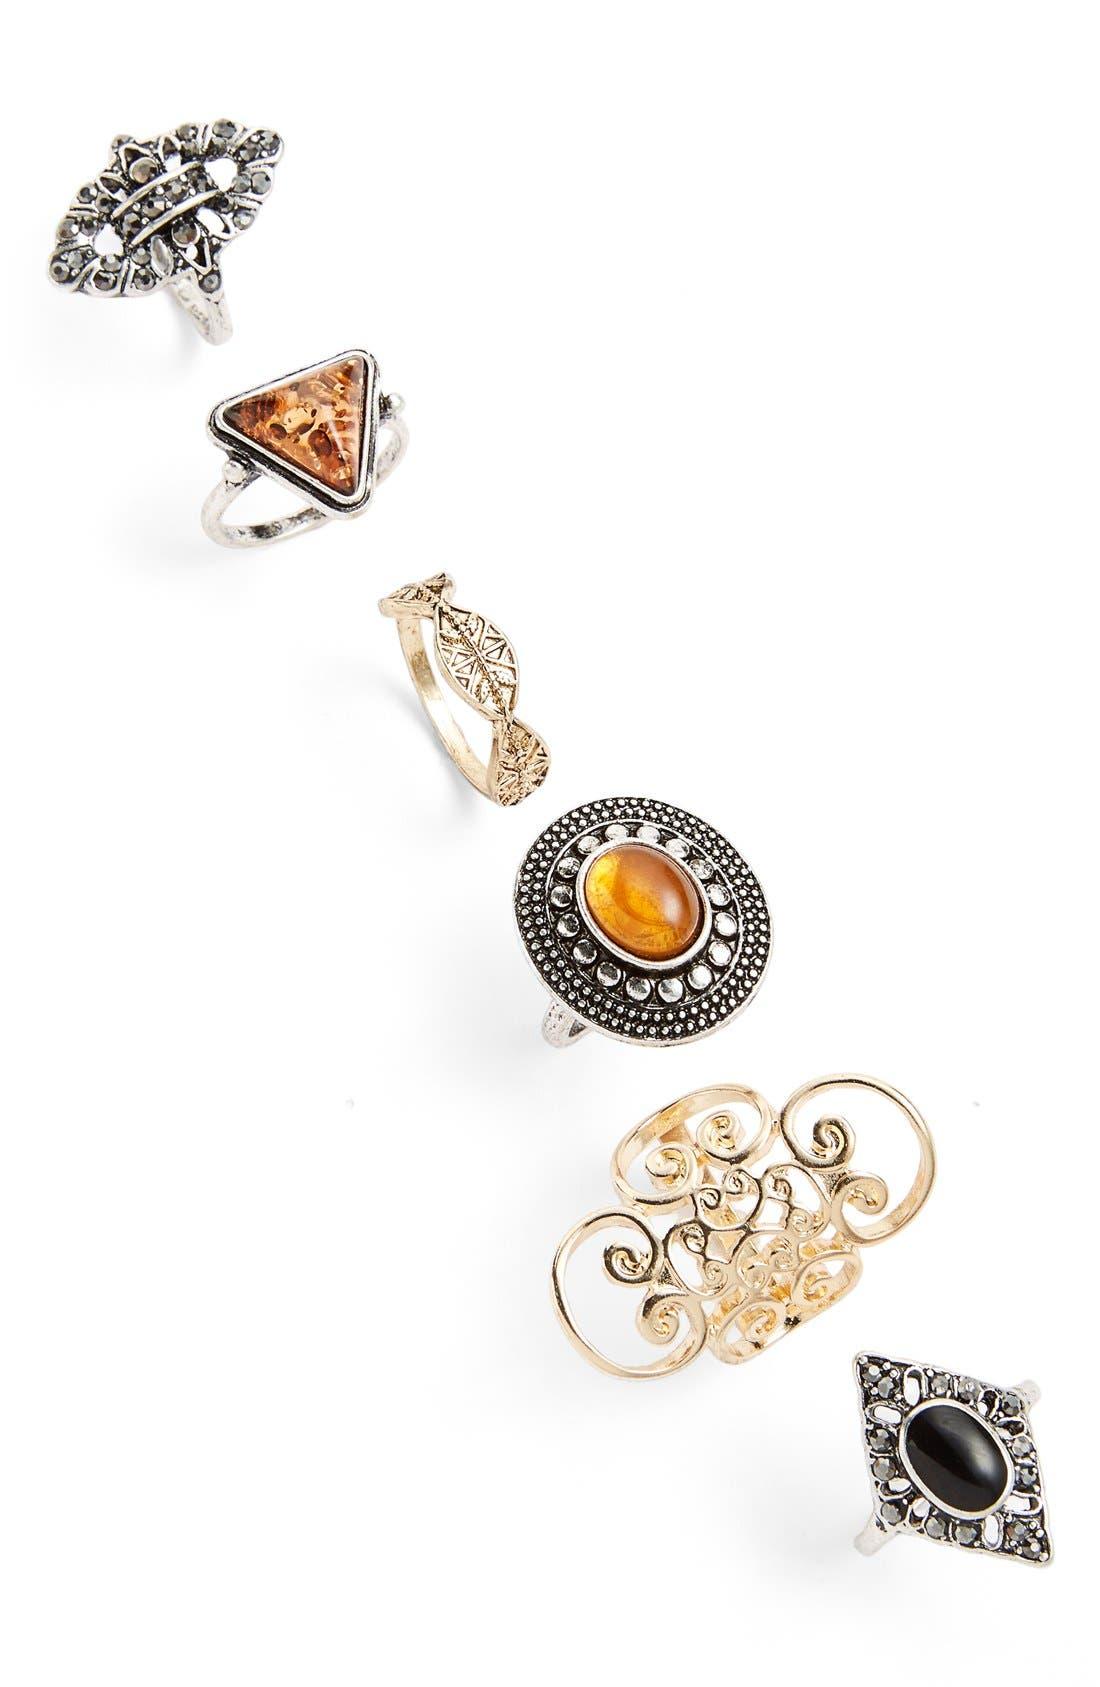 Main Image - Topshop 'Amber Look' Rings (Set of 6)